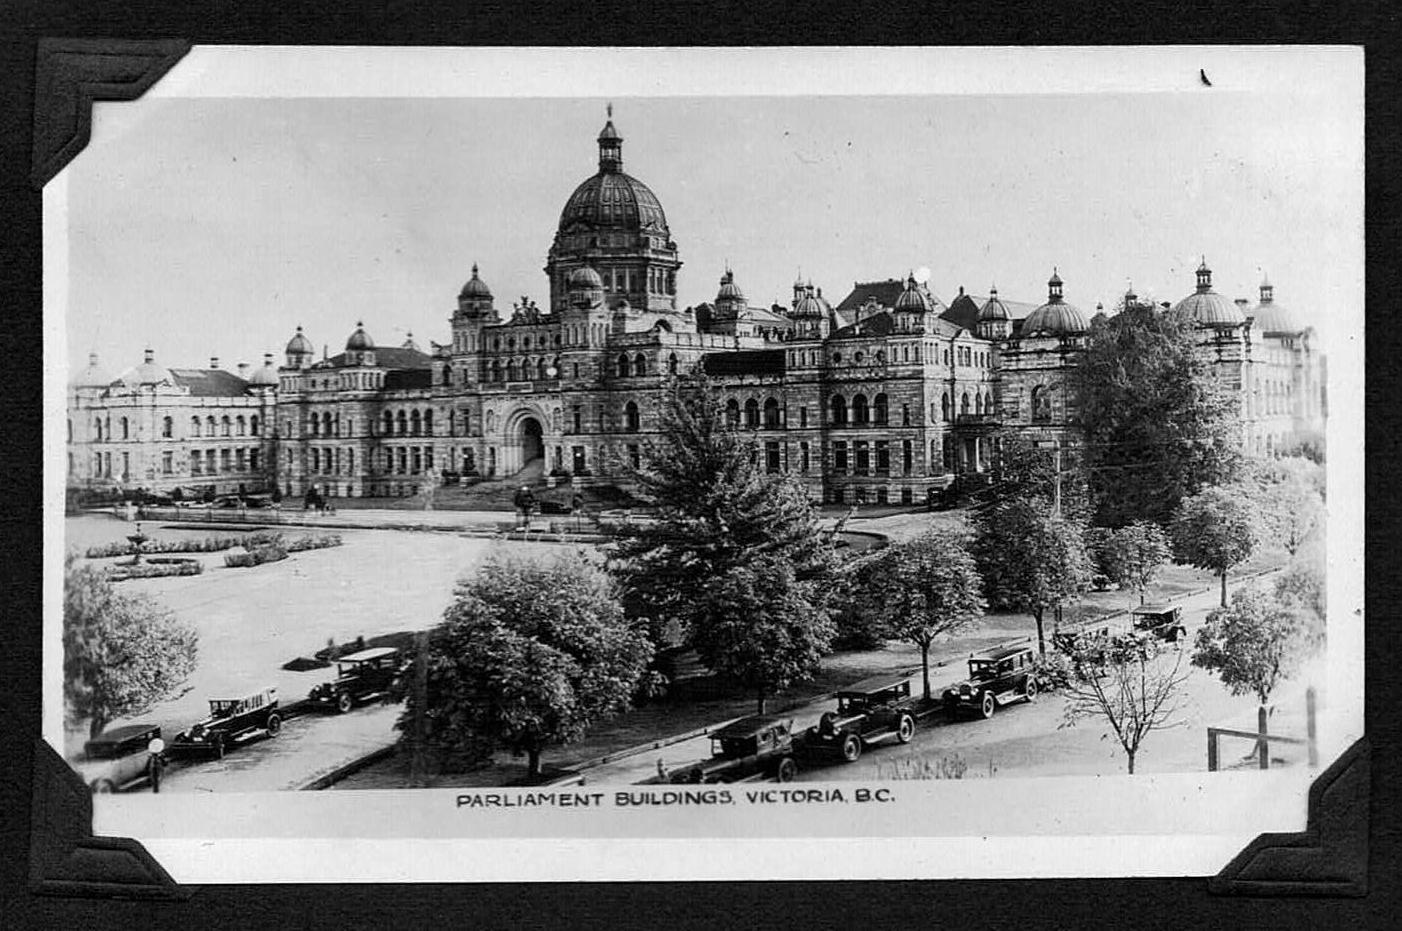 Parliament Buildings Victoria BC